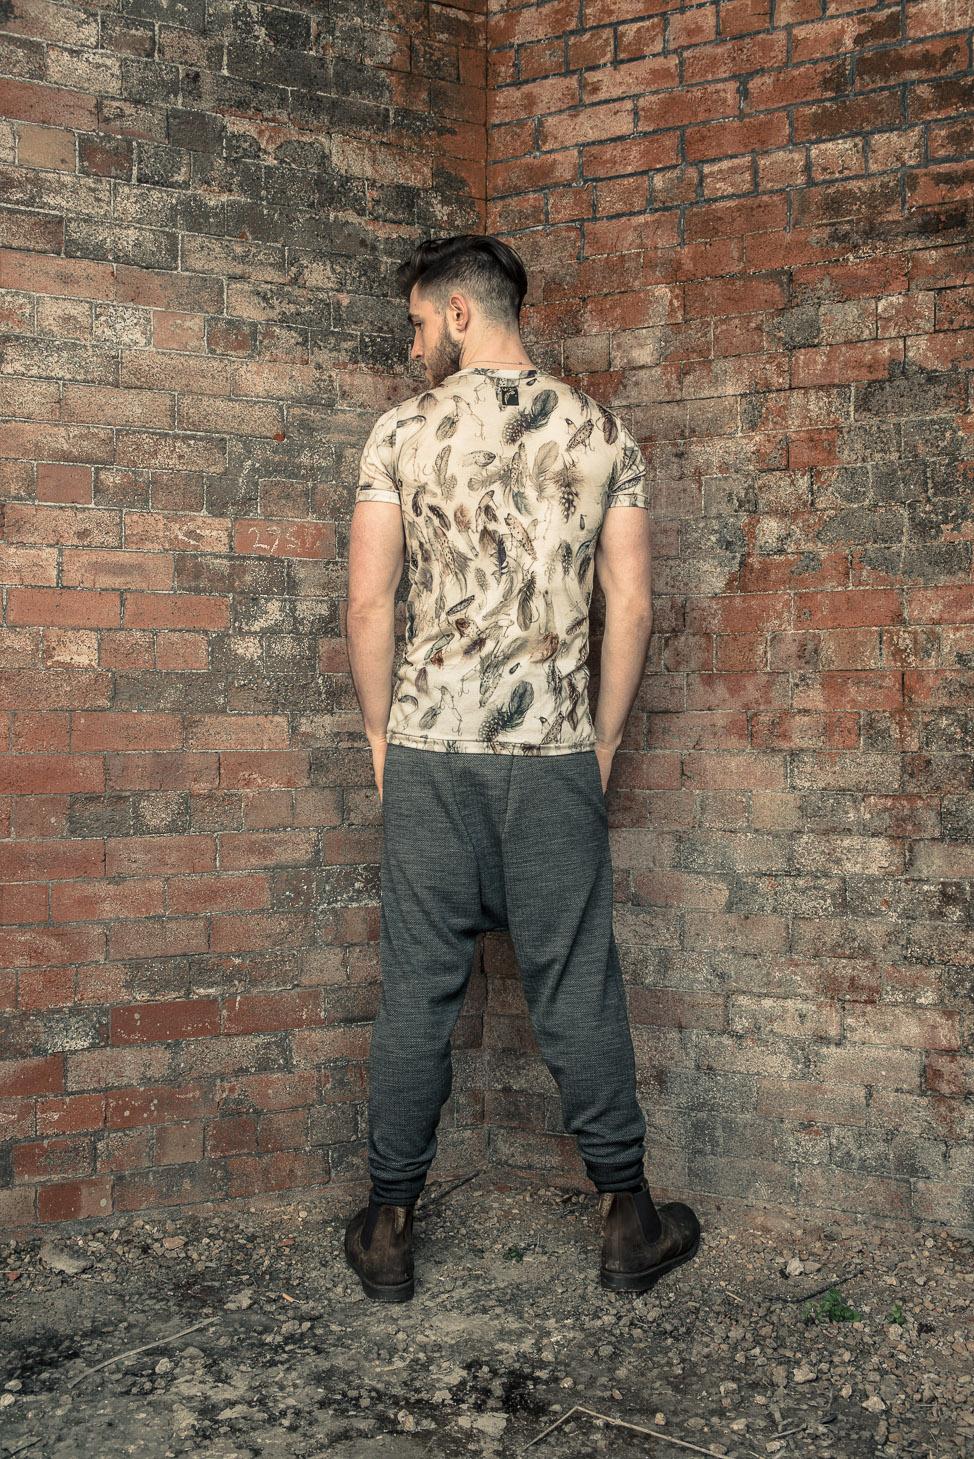 zaramia-ava-zaramiaava-leeds-fashion-designer-ethical-sustainable-tailored-minimalist-fitted-versatile-drape-koji-grey-tshirt-top-hareem-trousers-black-grey-texture-styling-menswear-model-24